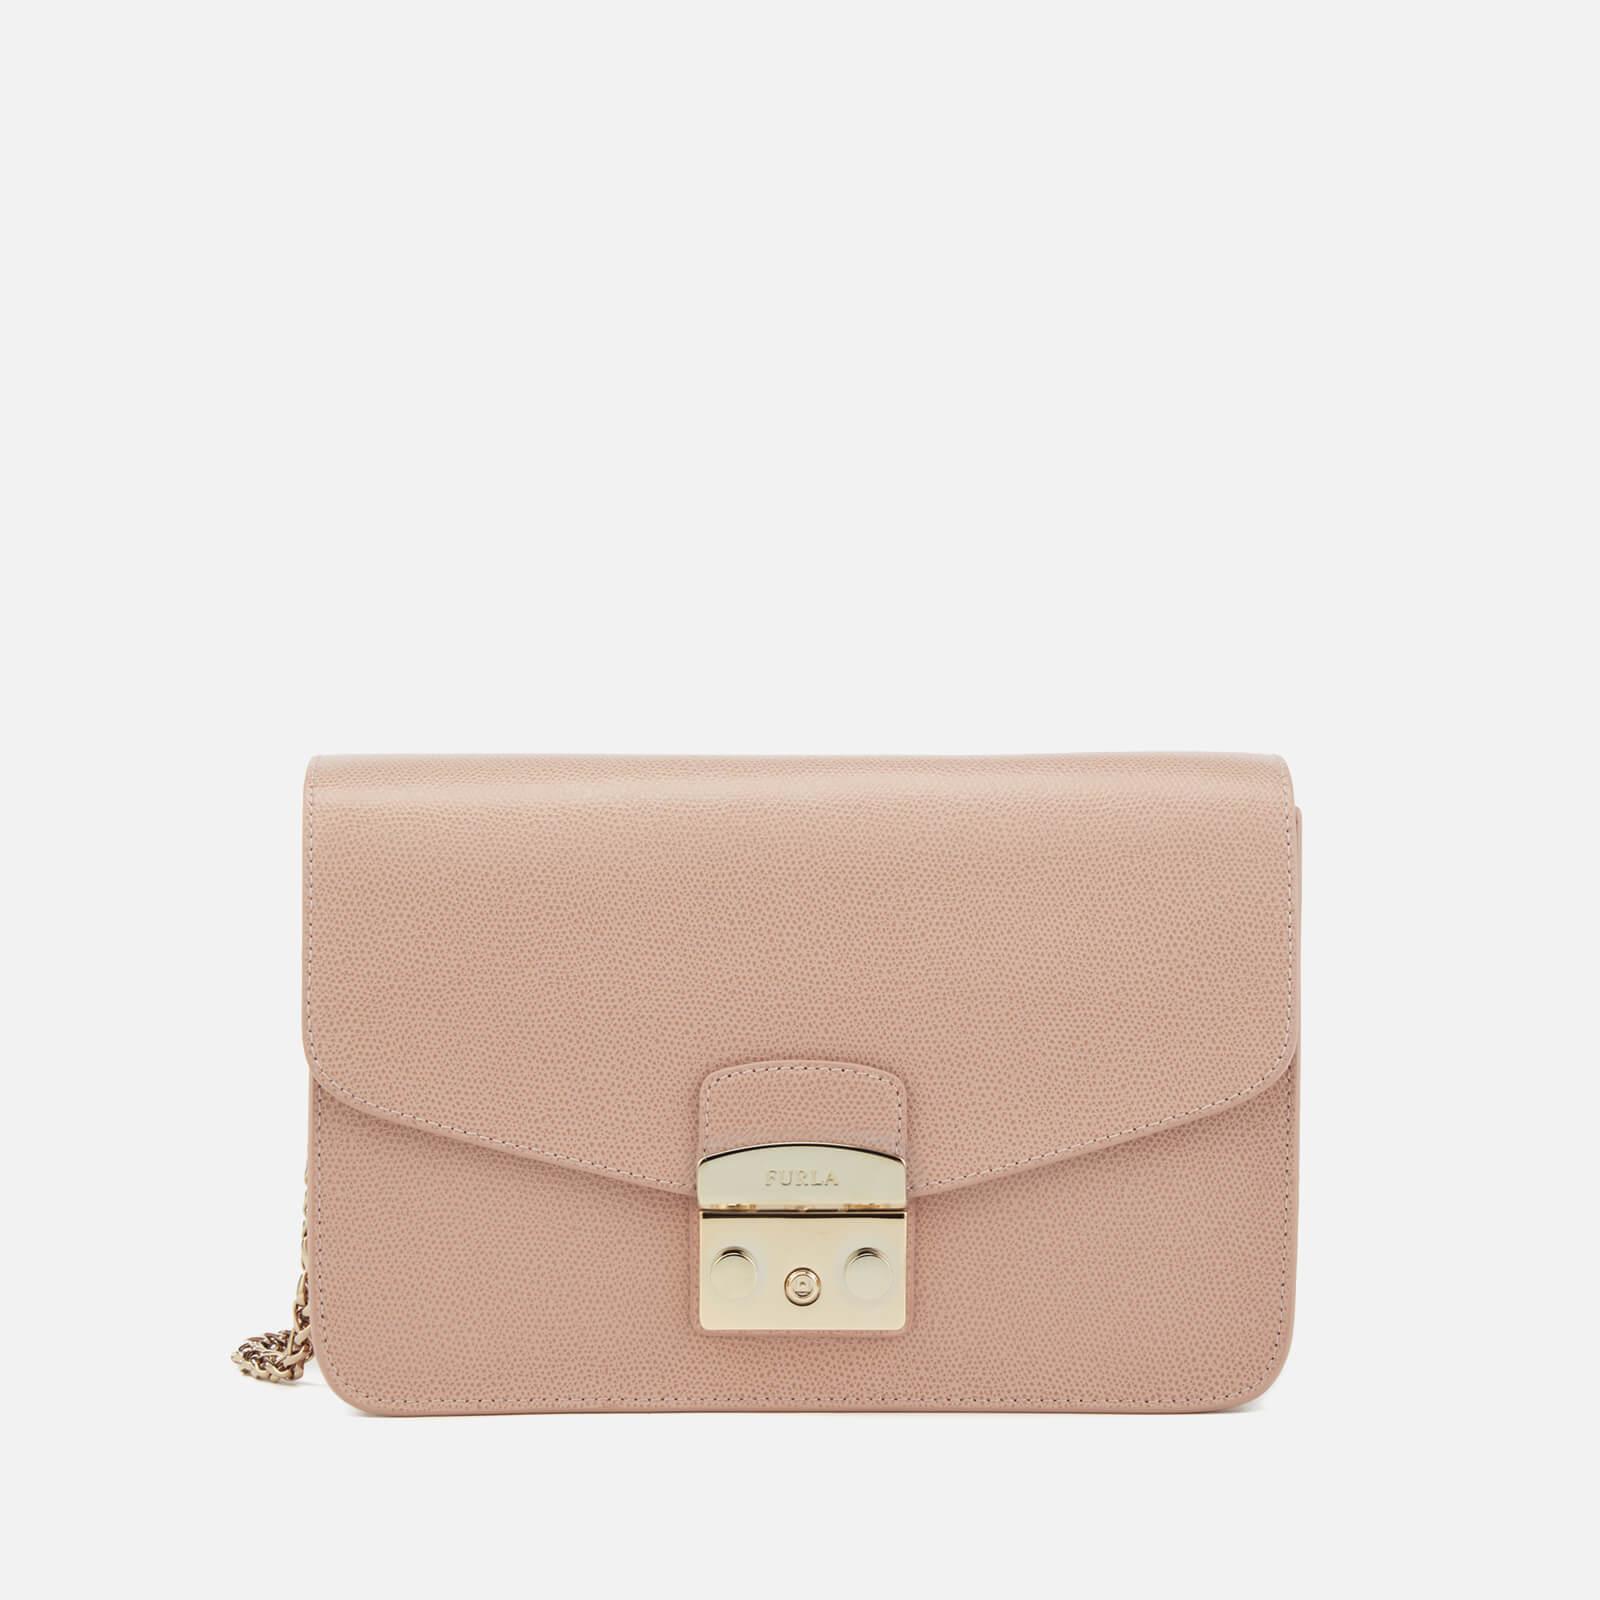 400fe42d40 Furla Women s Metropolis Shoulder Bag - Moonstone - Free UK Delivery ...